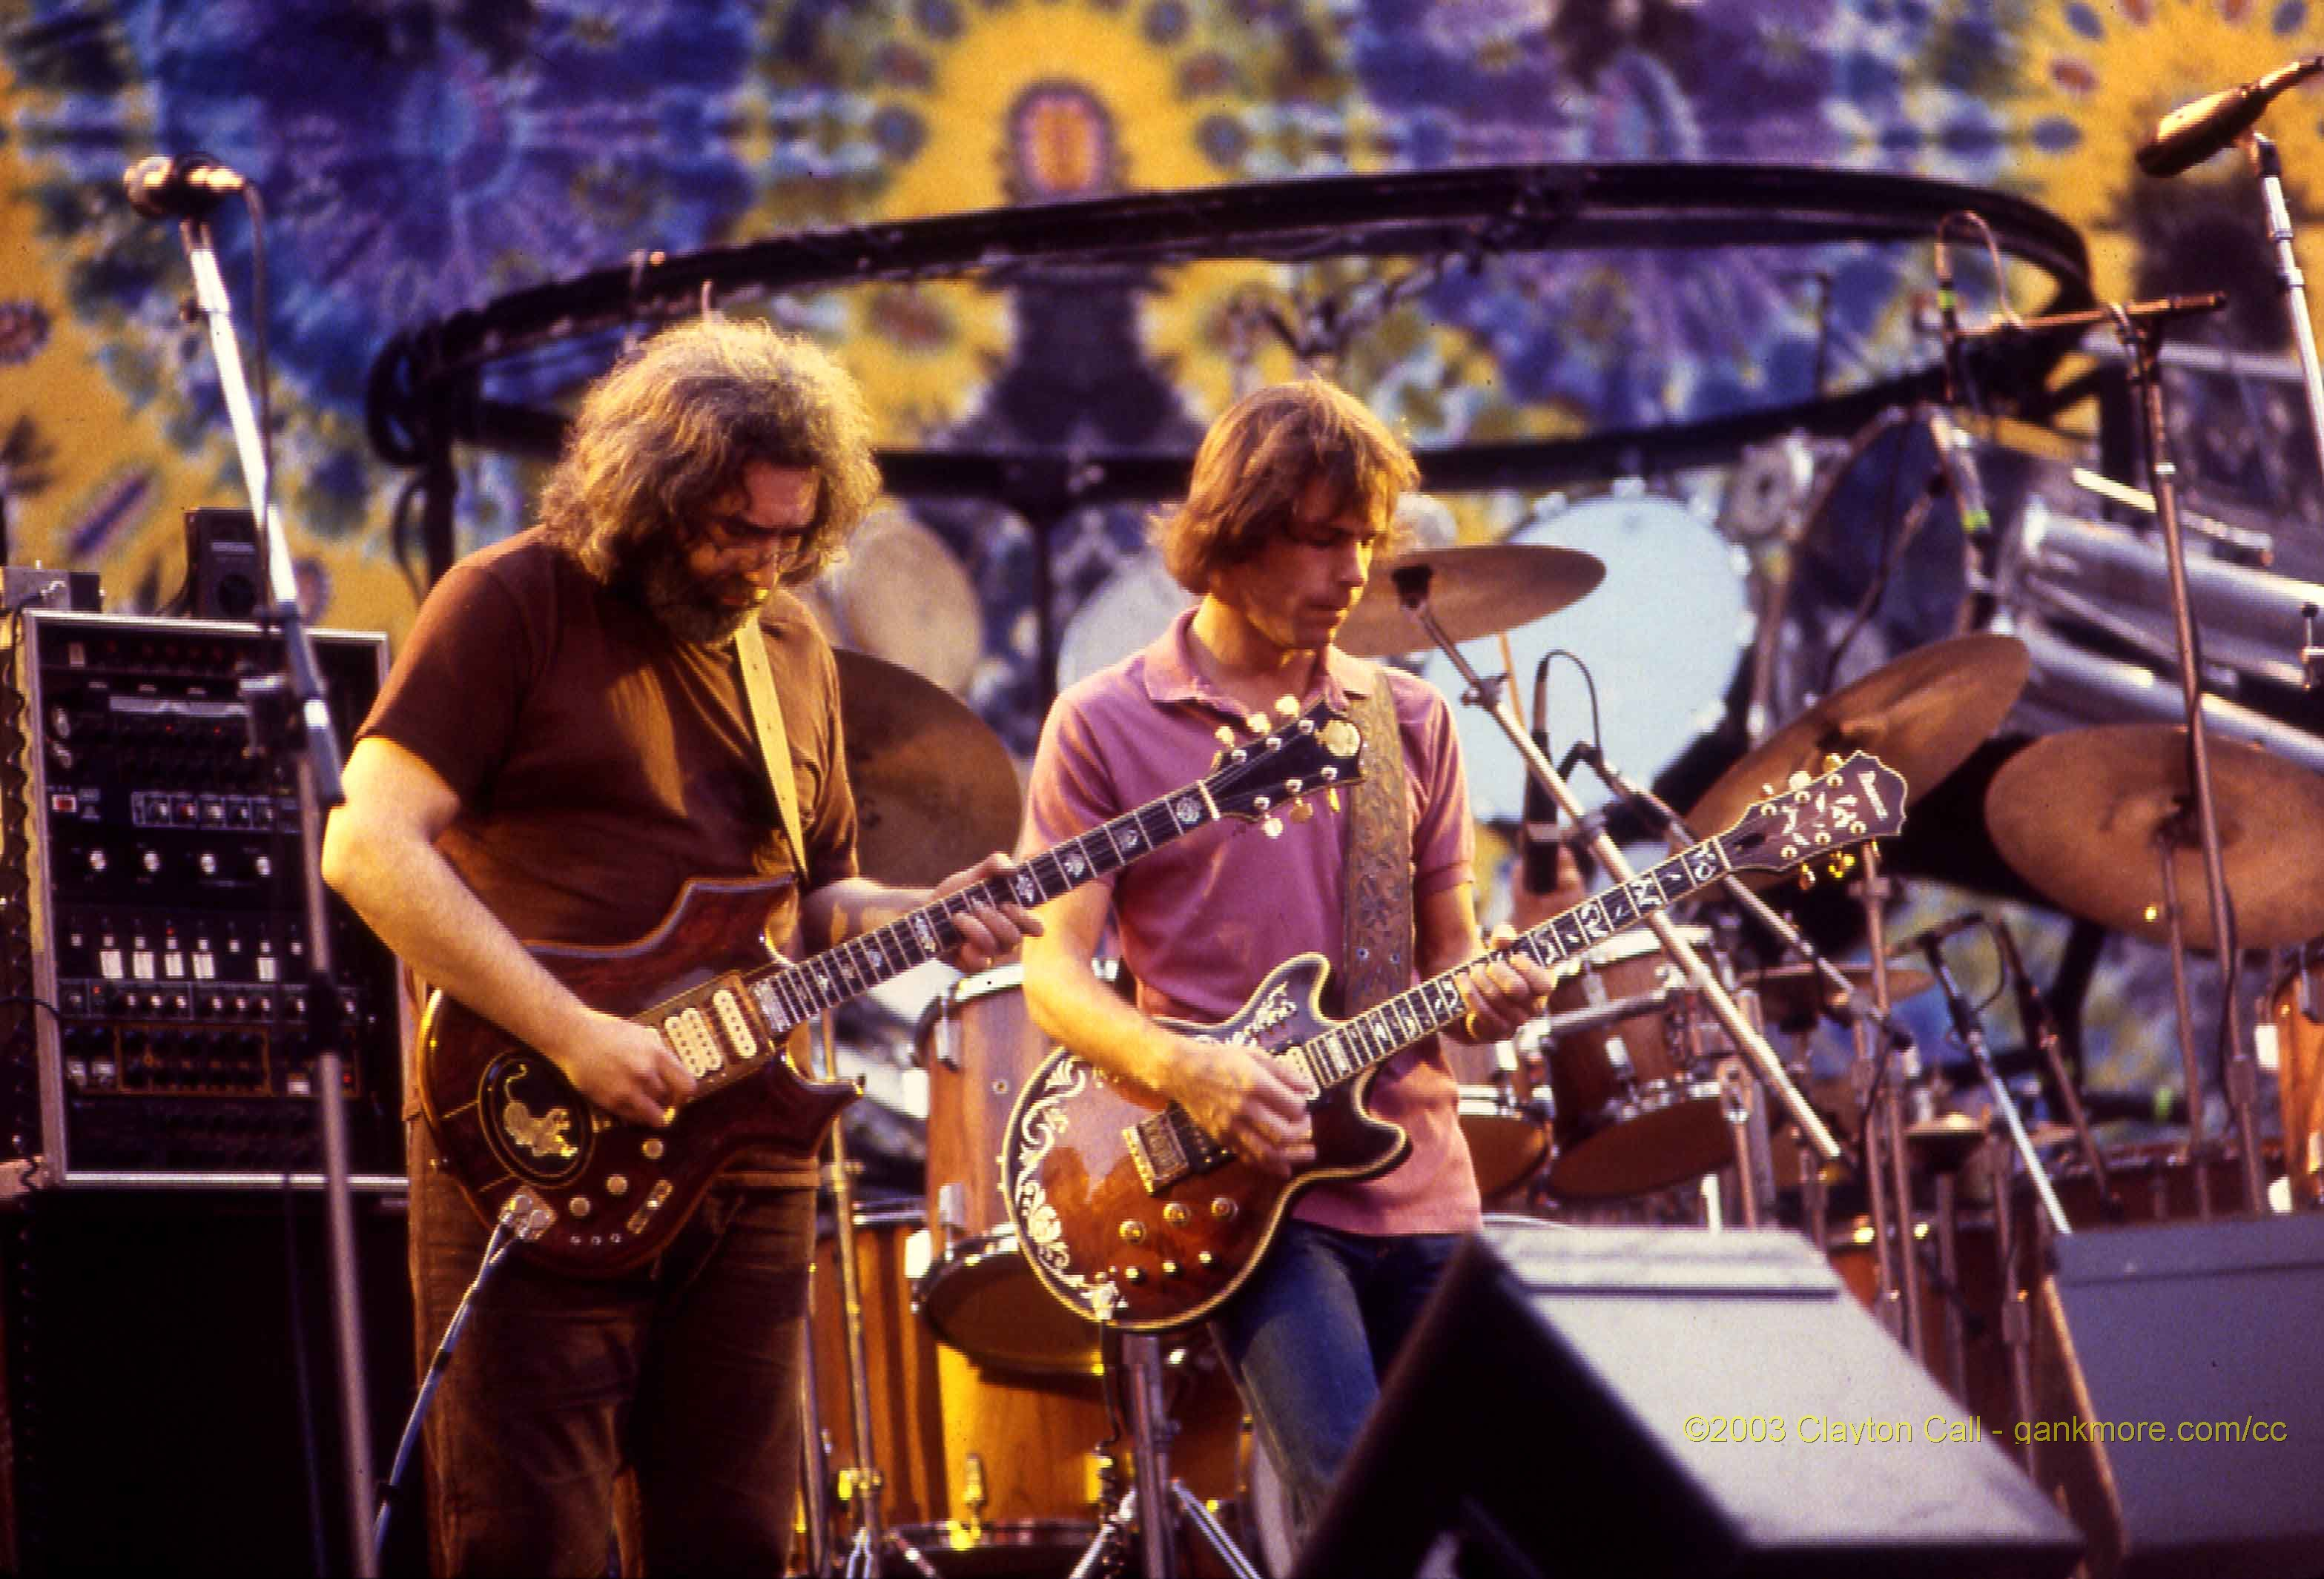 Music Bands 60s The Grateful Dead Jerry Garcia